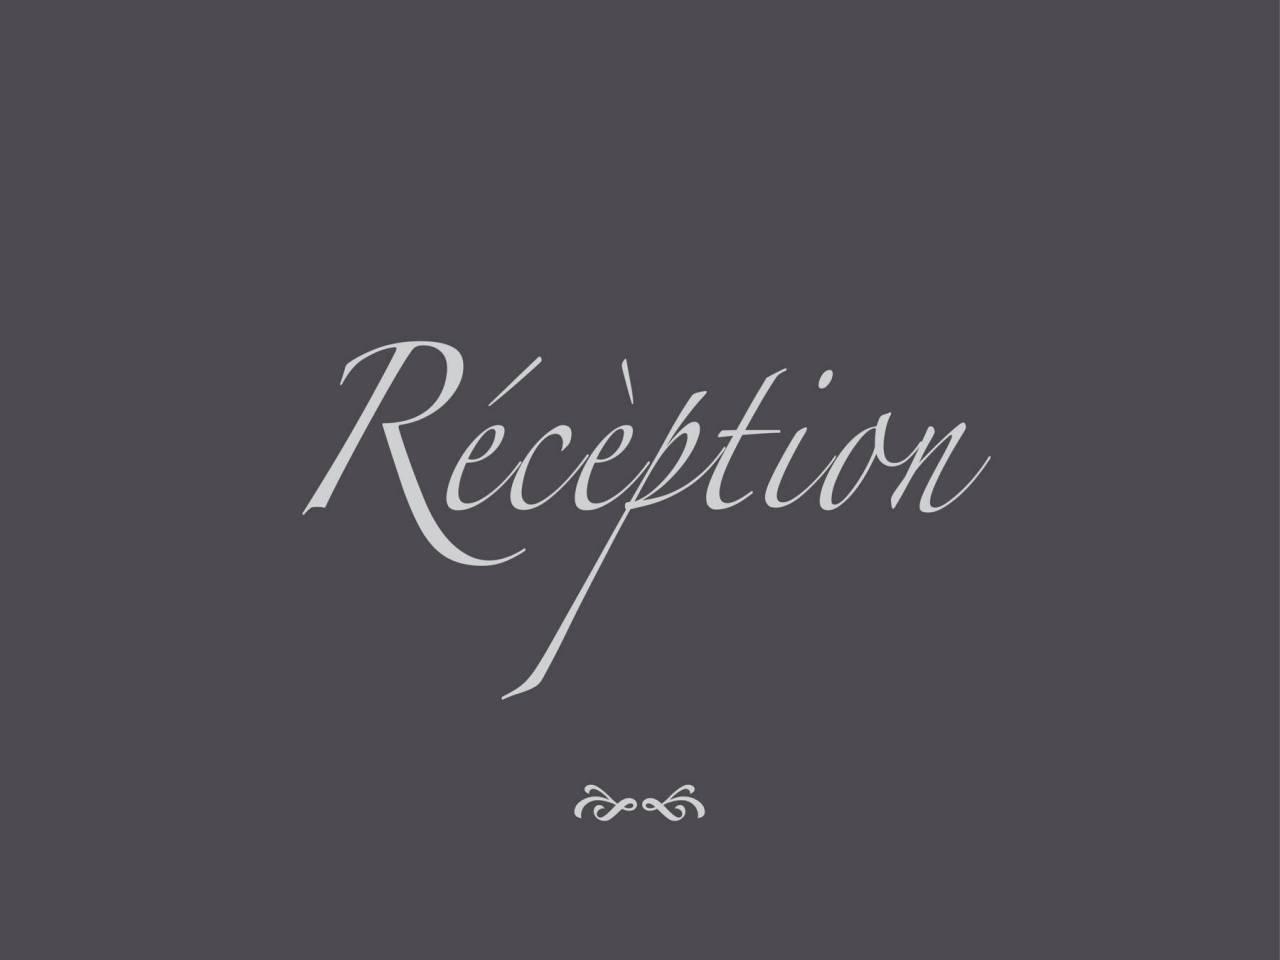 reception_02